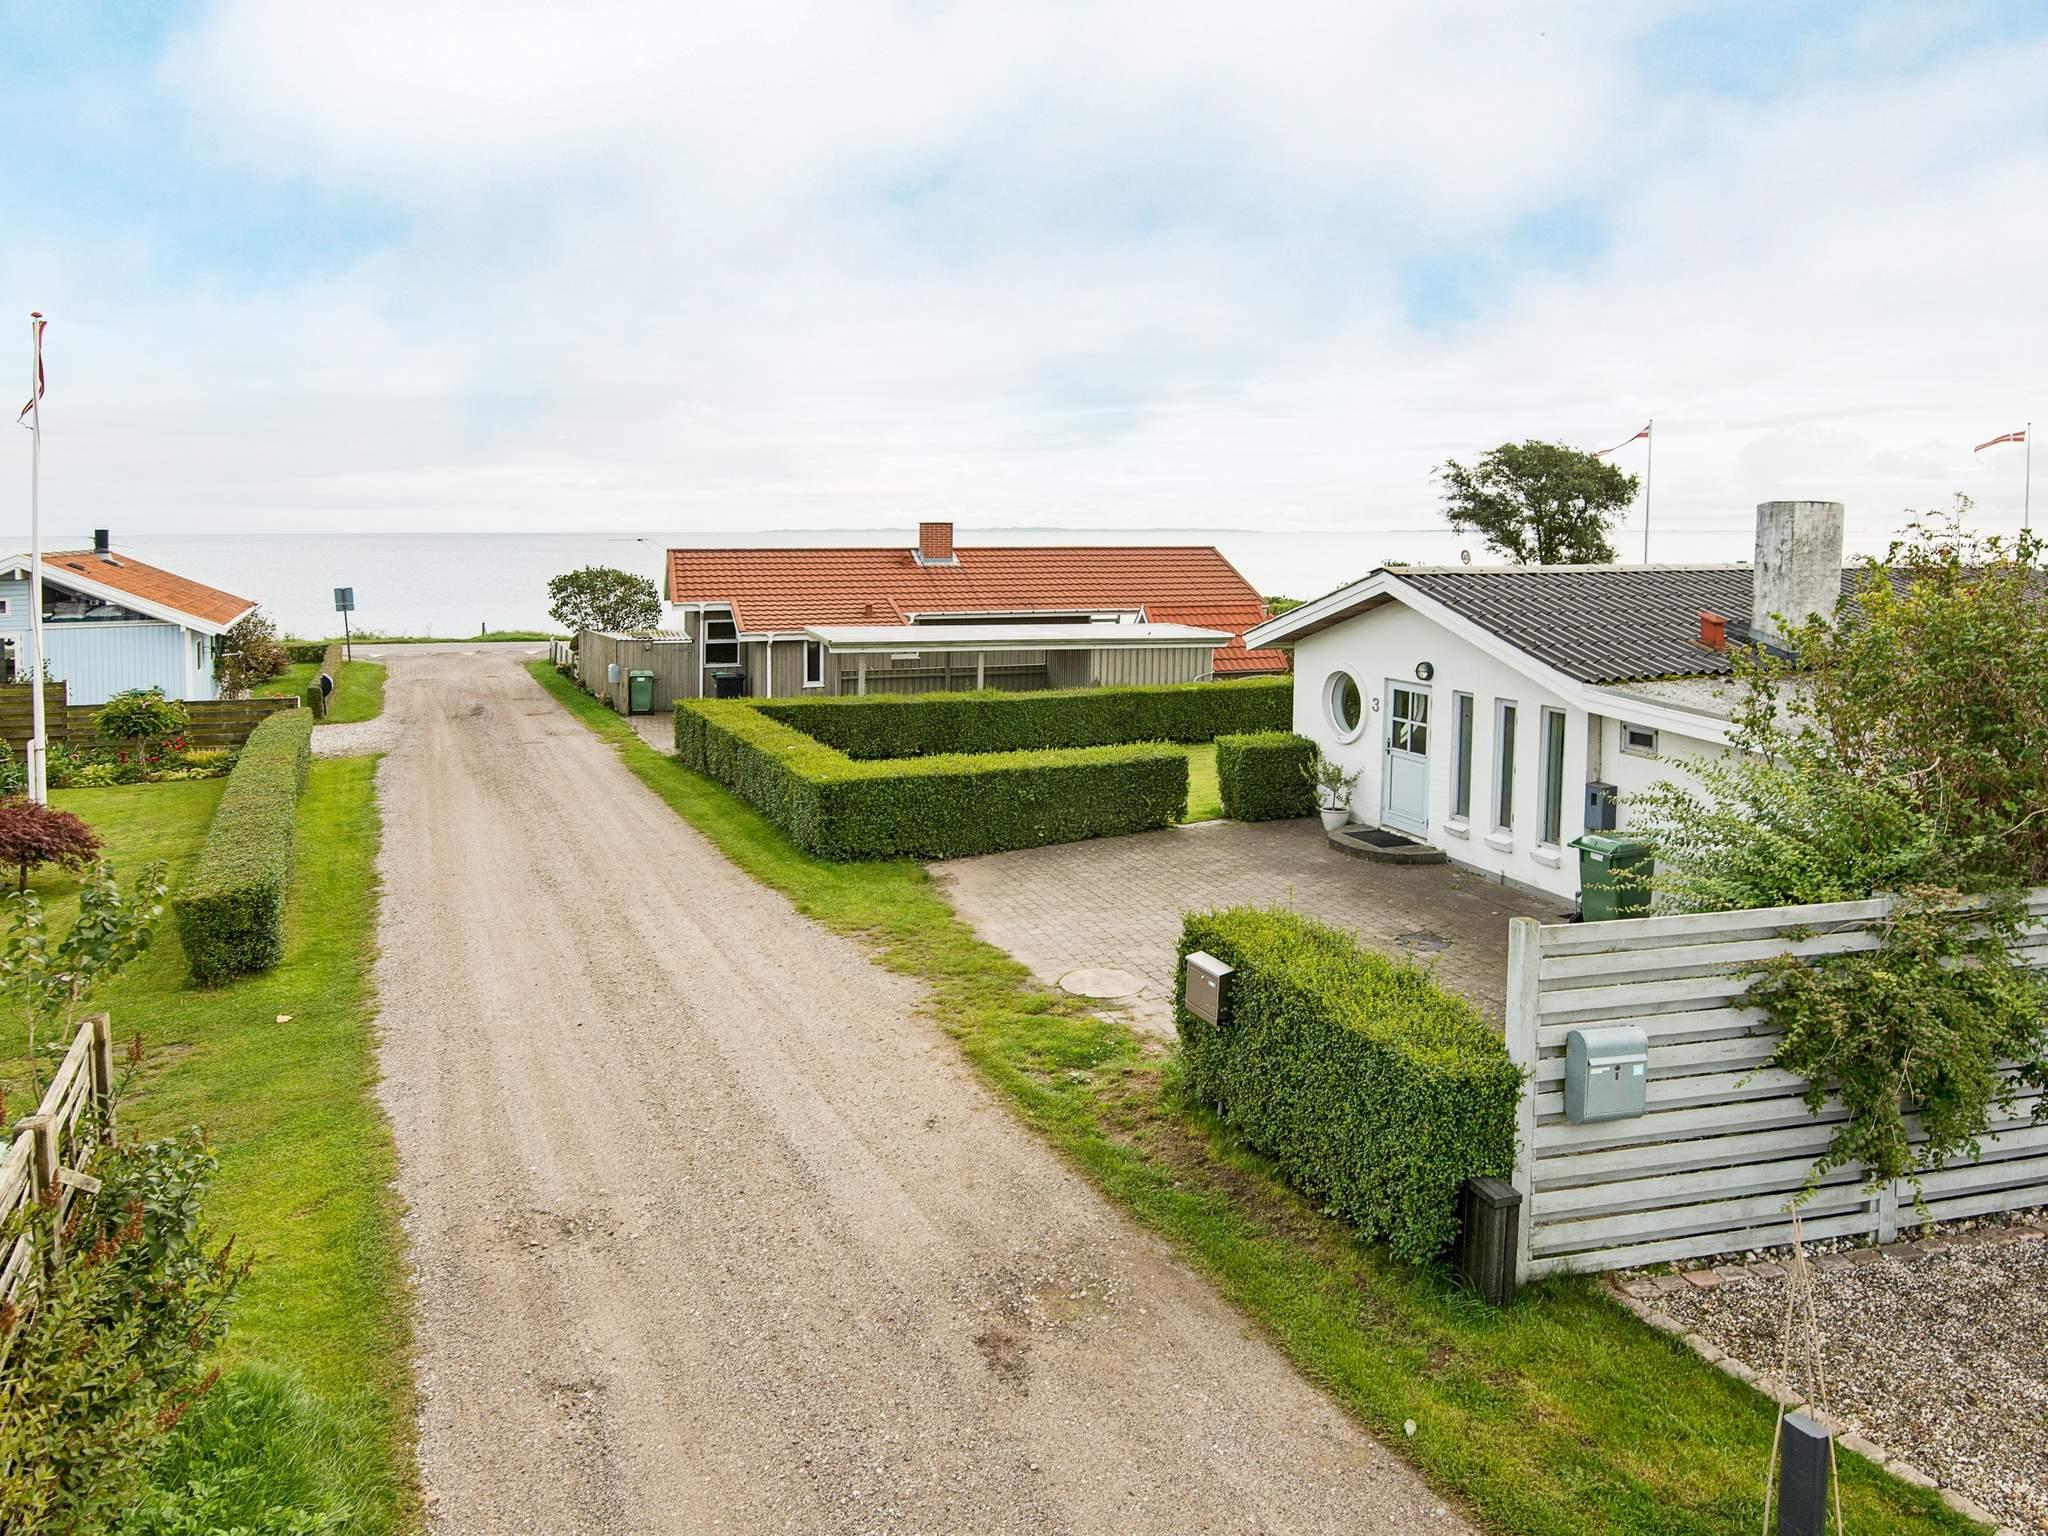 Ferienhaus Ajstrup Strand/Malling (2355032), Ajstrup, , Dänische Ostsee, Dänemark, Bild 14